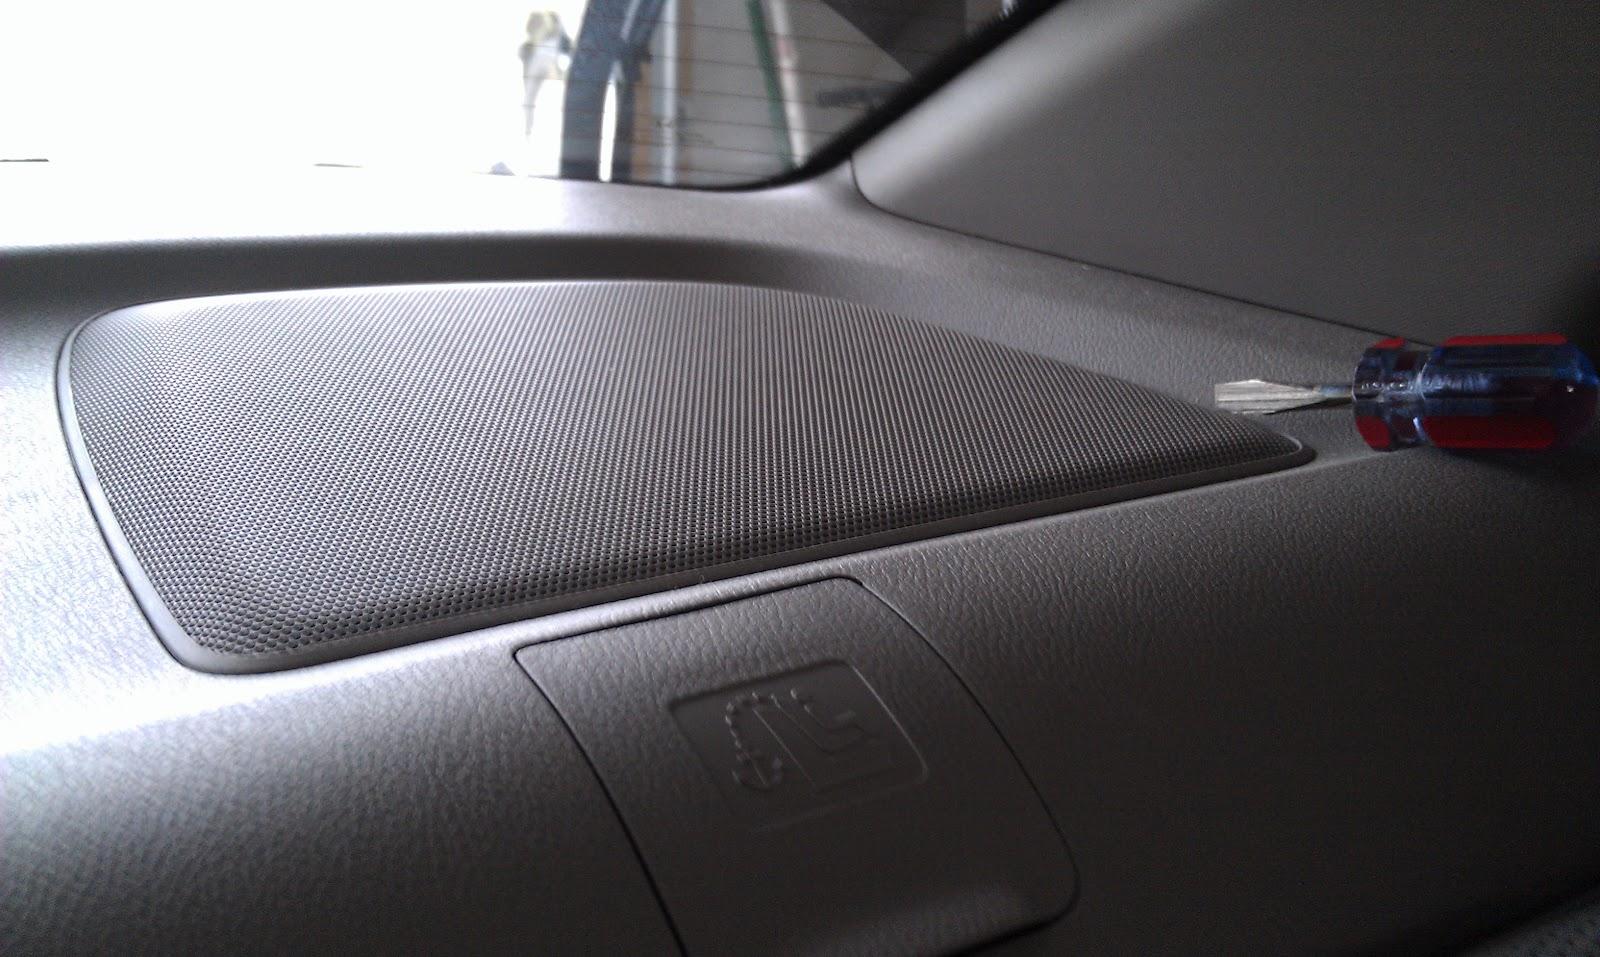 Adam Millers Blog How To Replace Rear Speakers In A Honda Accord 2013 Civic Ex Speaker Wiring Diagram